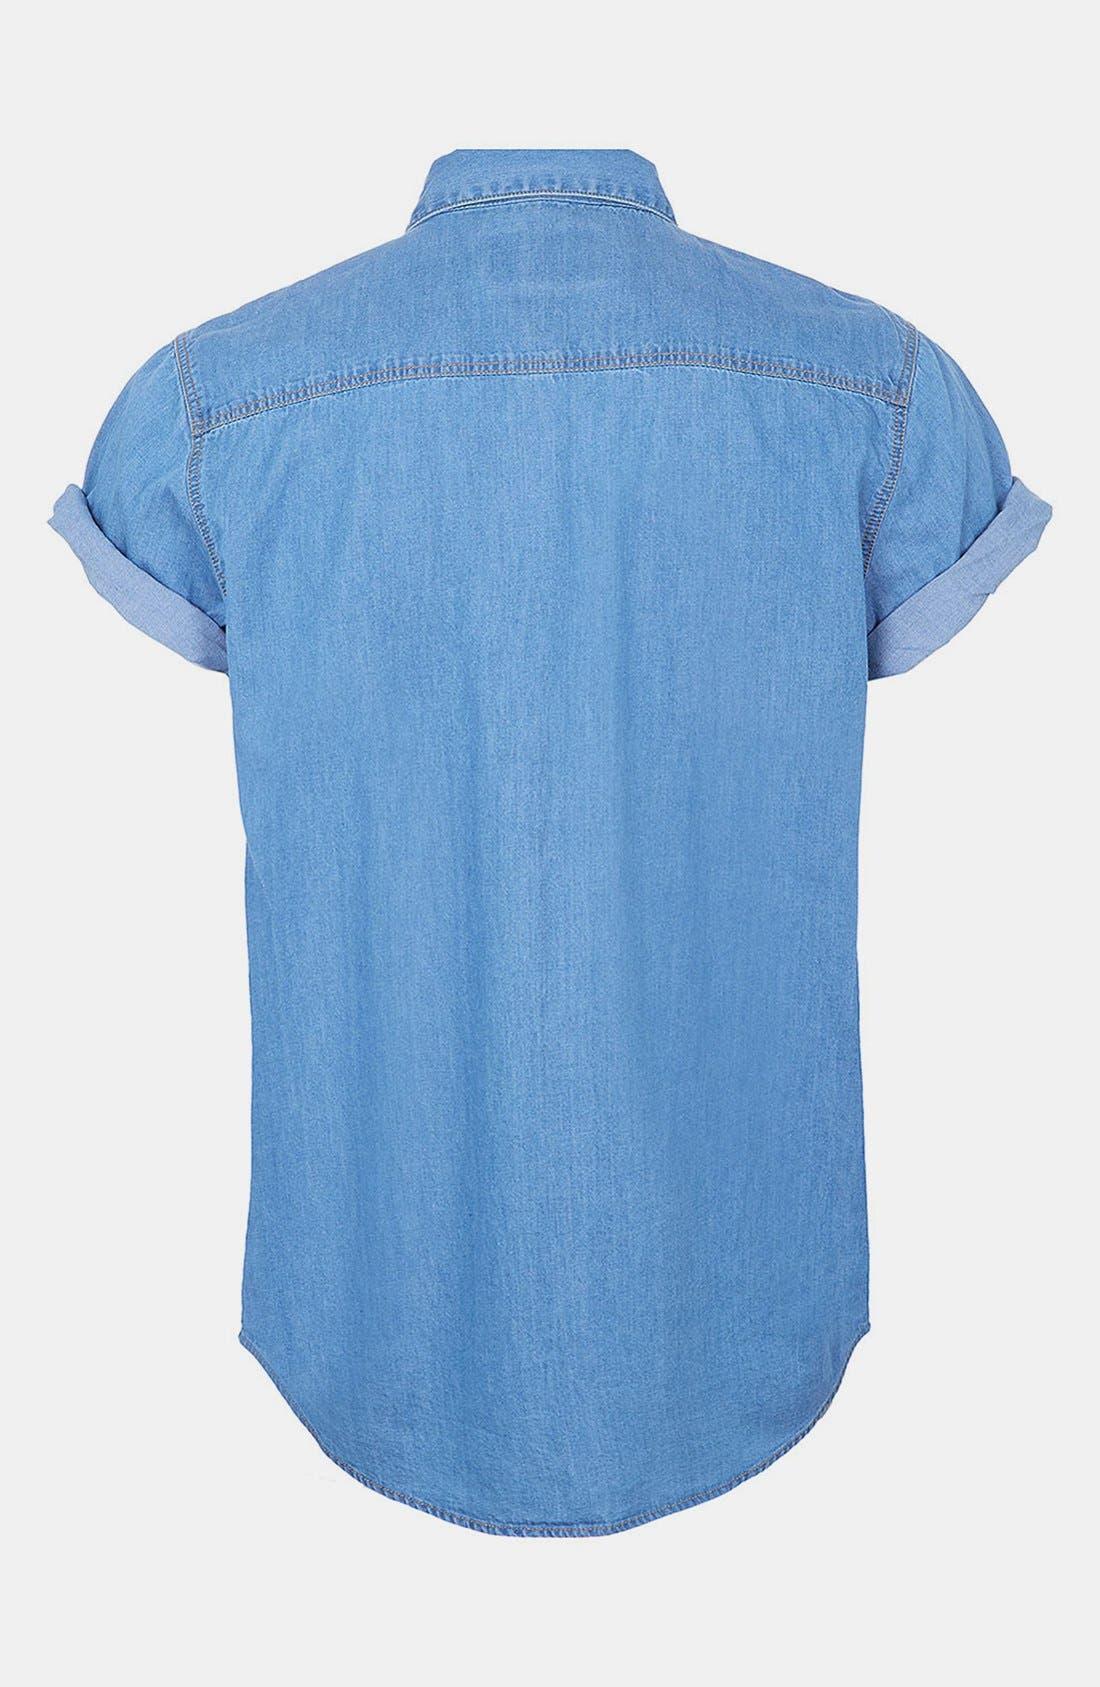 Alternate Image 2  - Topman Short Sleeve Pattern Print Denim Shirt